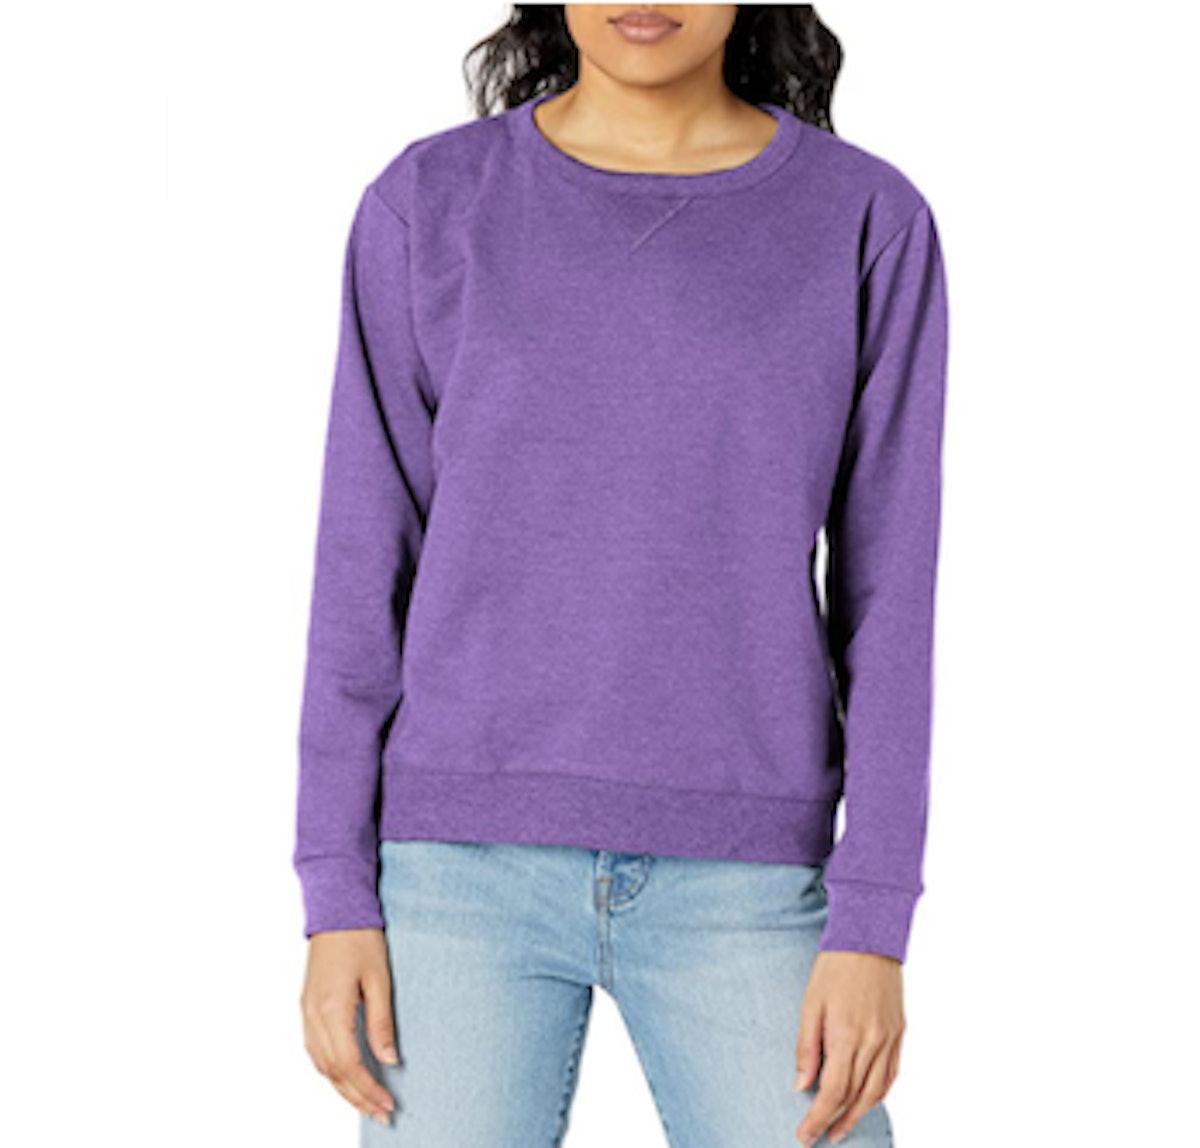 Hanes V-Notch Fleece Sweatshirt